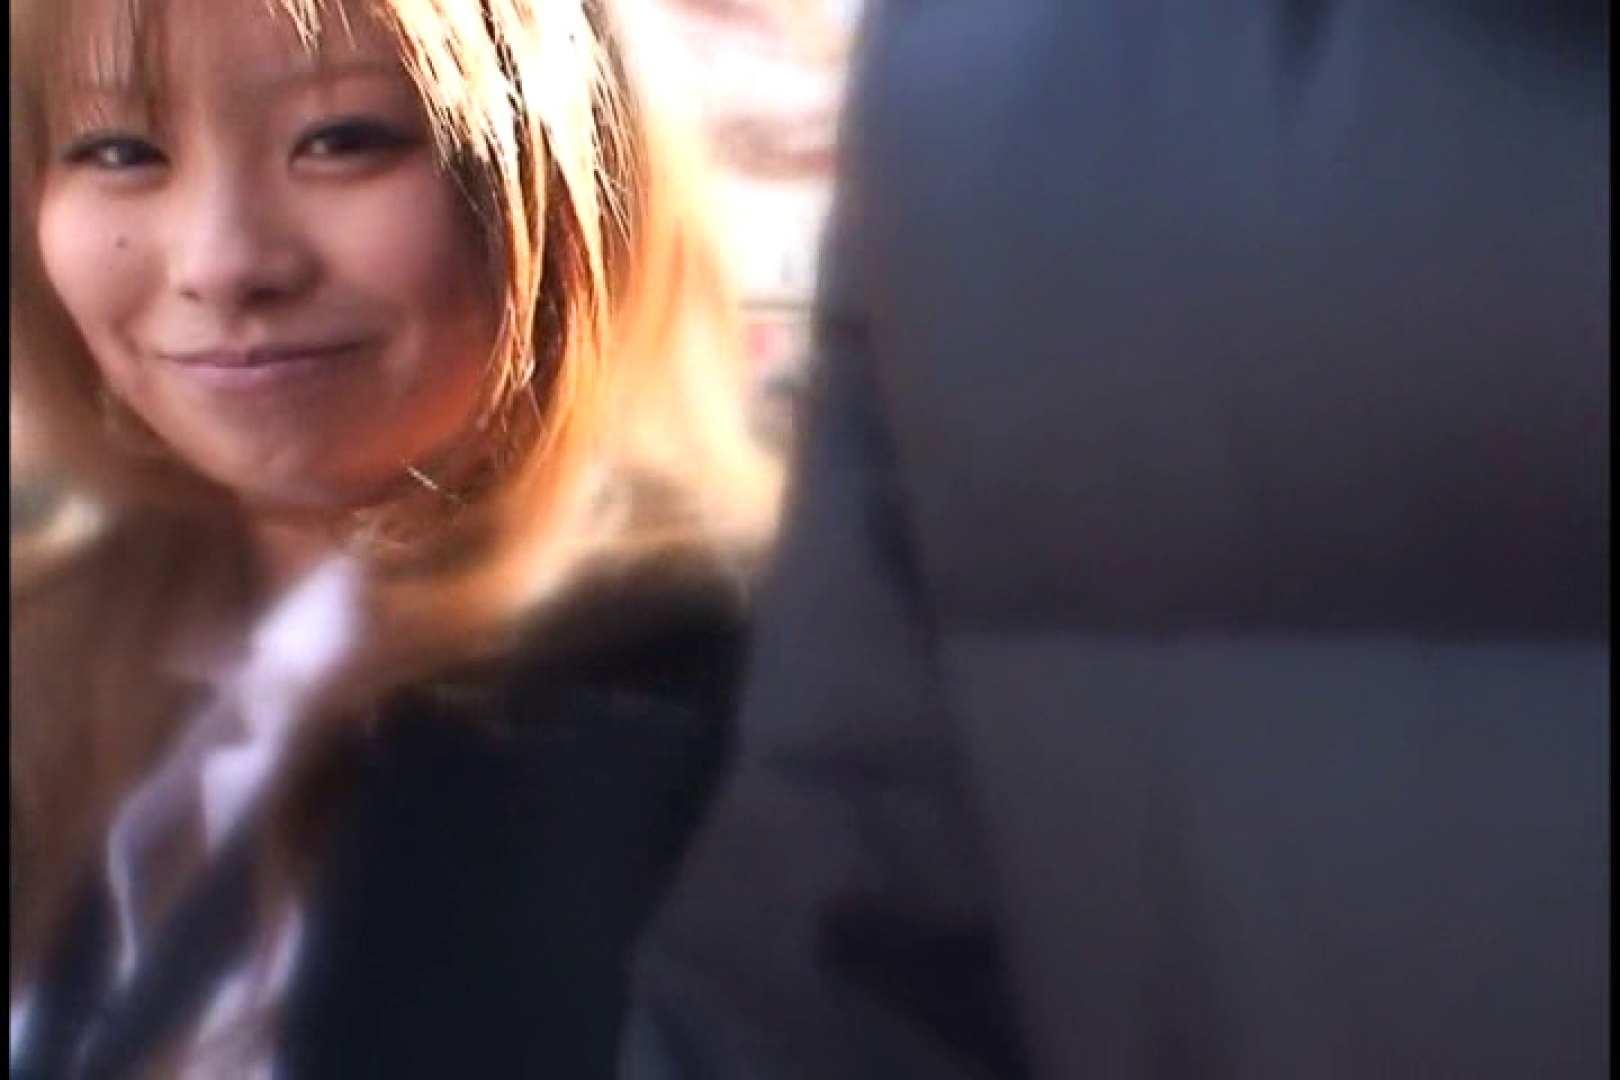 JDハンター全国ツアー vol.014 前編 女子大生のエロ動画 | 0  104PIX 41